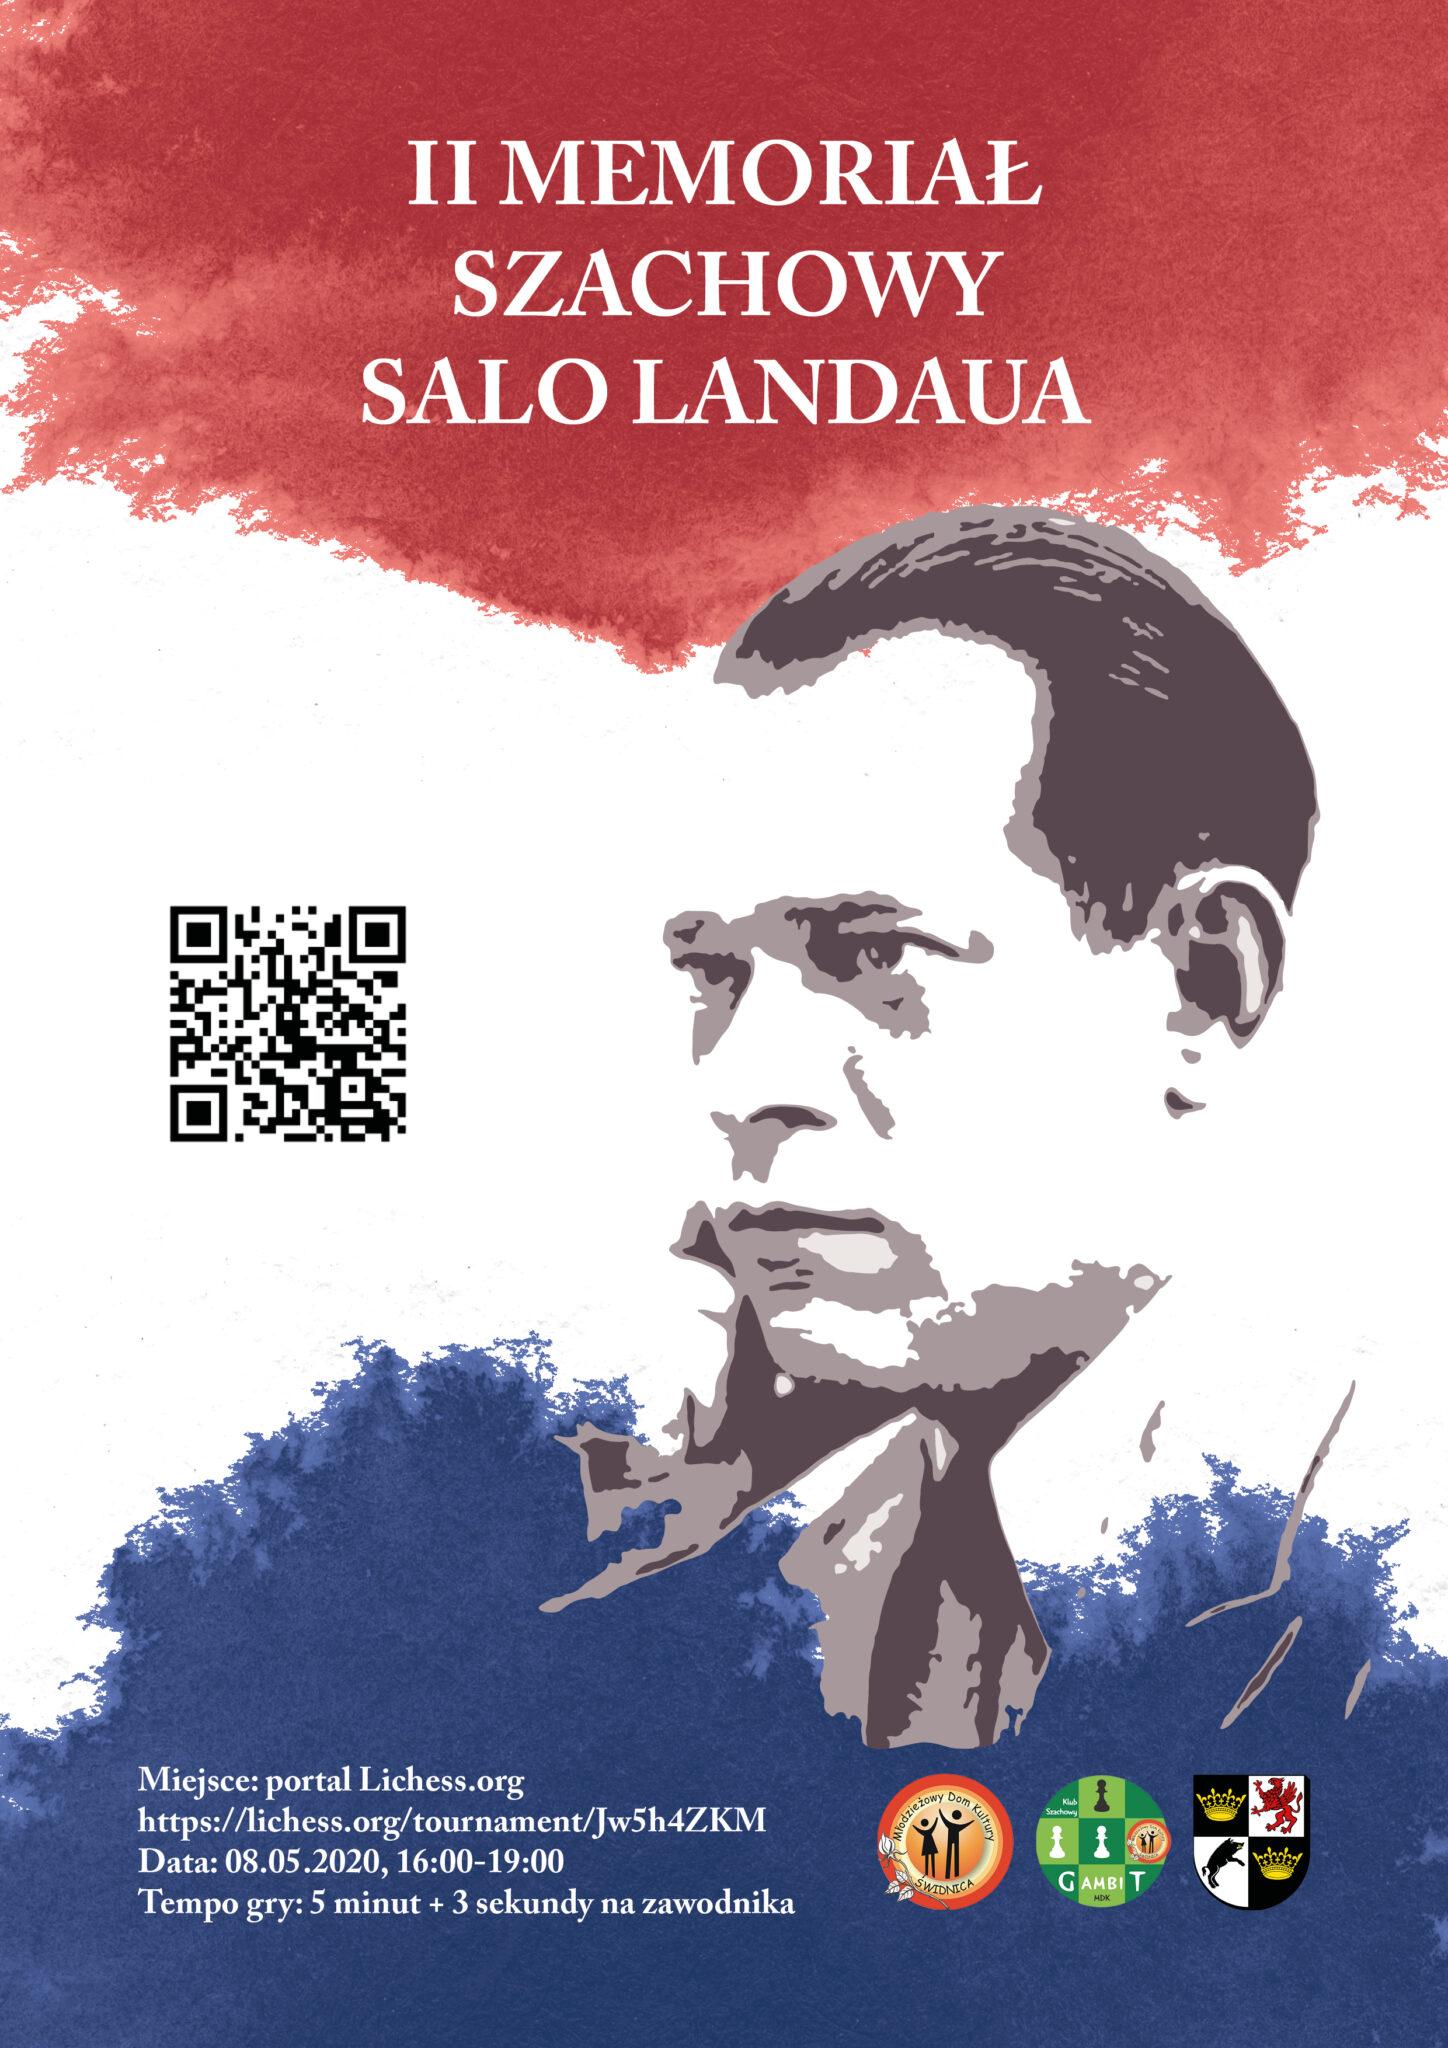 II Memoriał Szachowy Salo Landaua, 08.05.2020